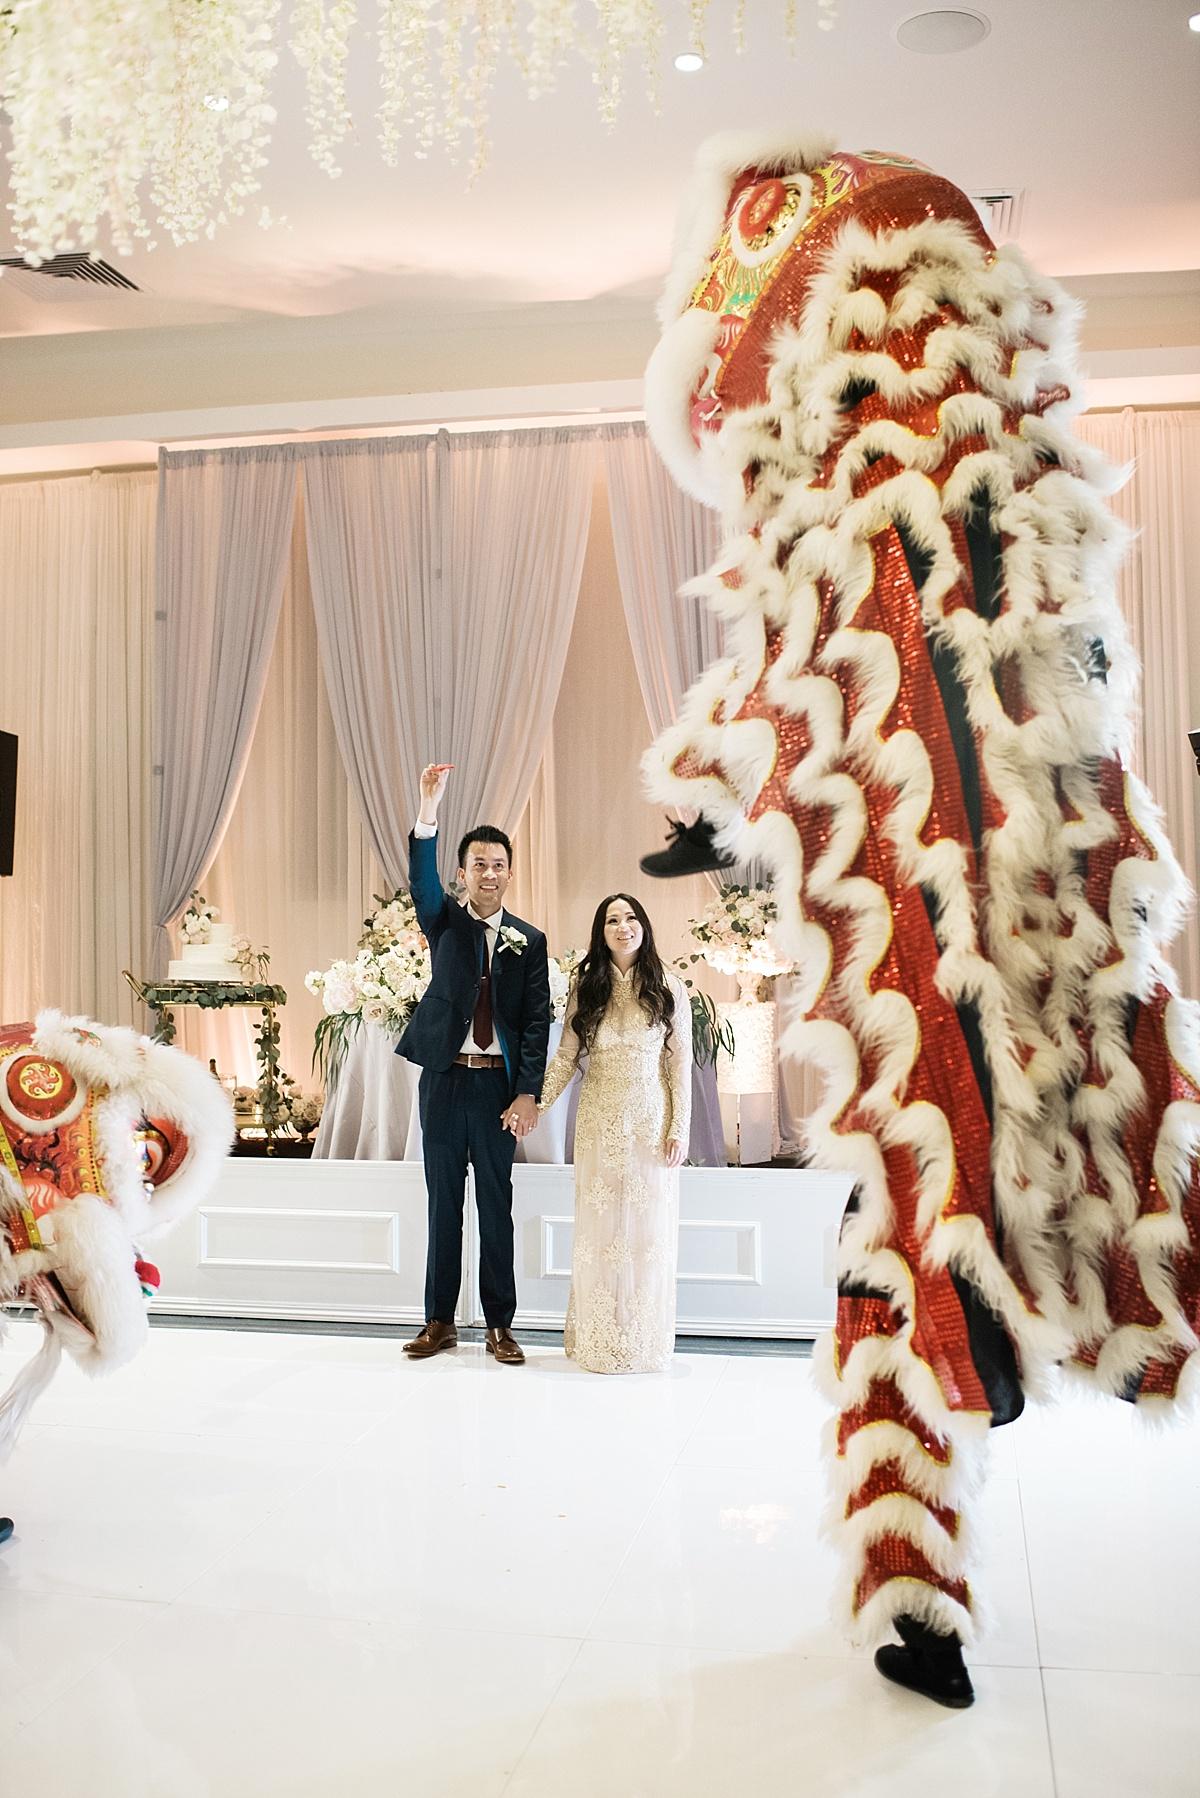 The-Venue-ByThree-Petals-Huntington-Beach-Wedding-Photographer-Christine-Andrew-Carissa-Woo-Photography_0110.jpg